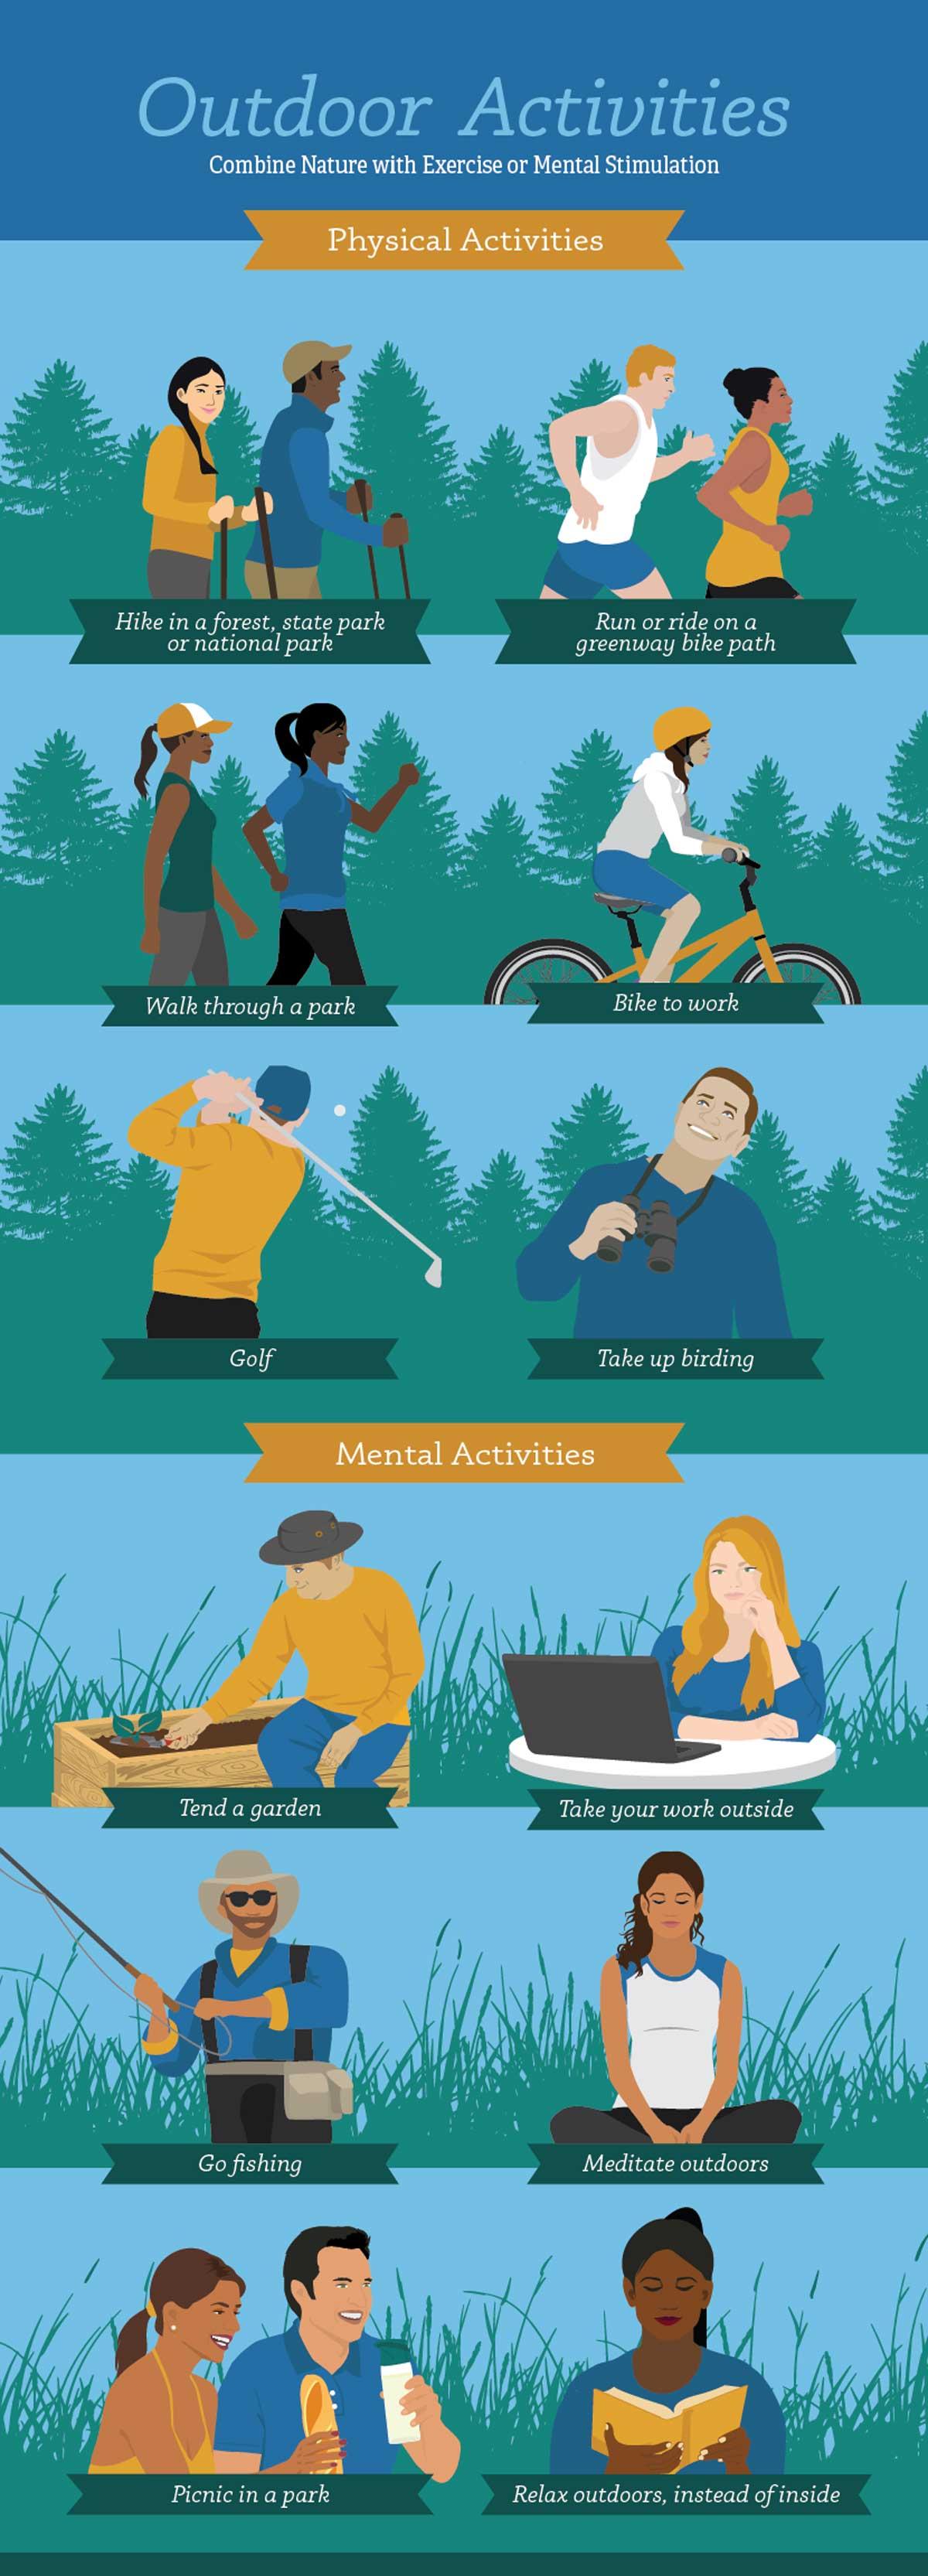 health-benefits-of-the-outdoors-activities